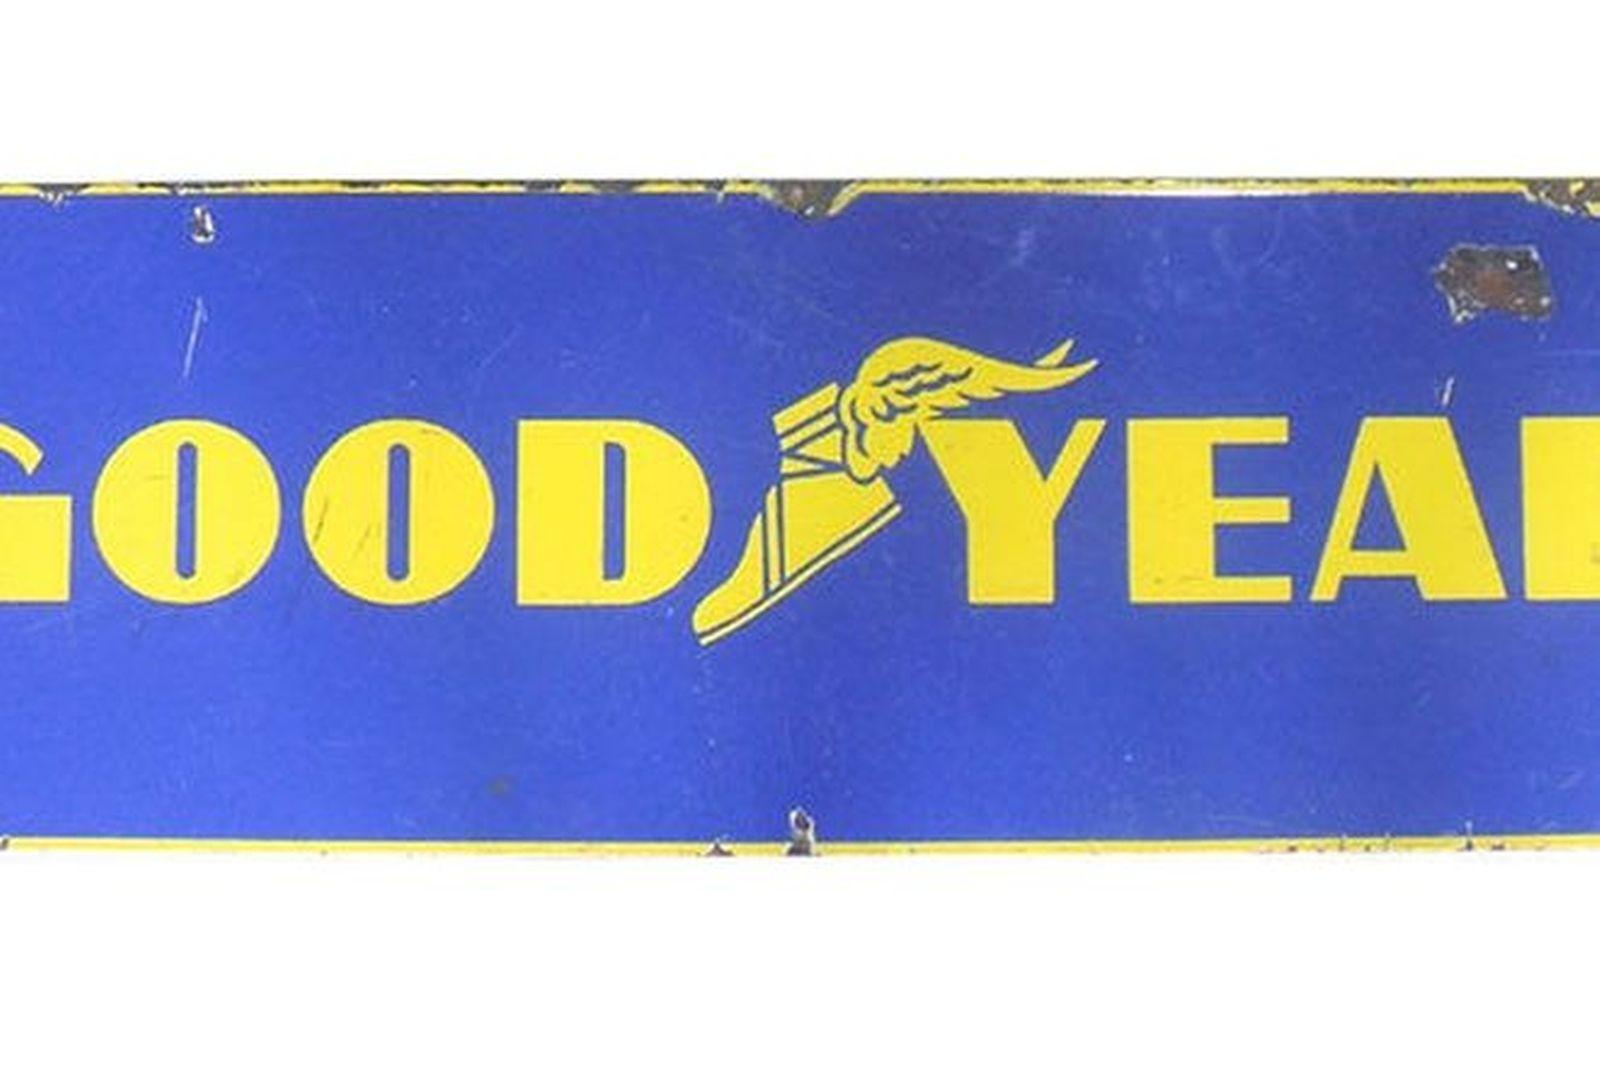 Enamel Sign - Goodyear (3' x 1')